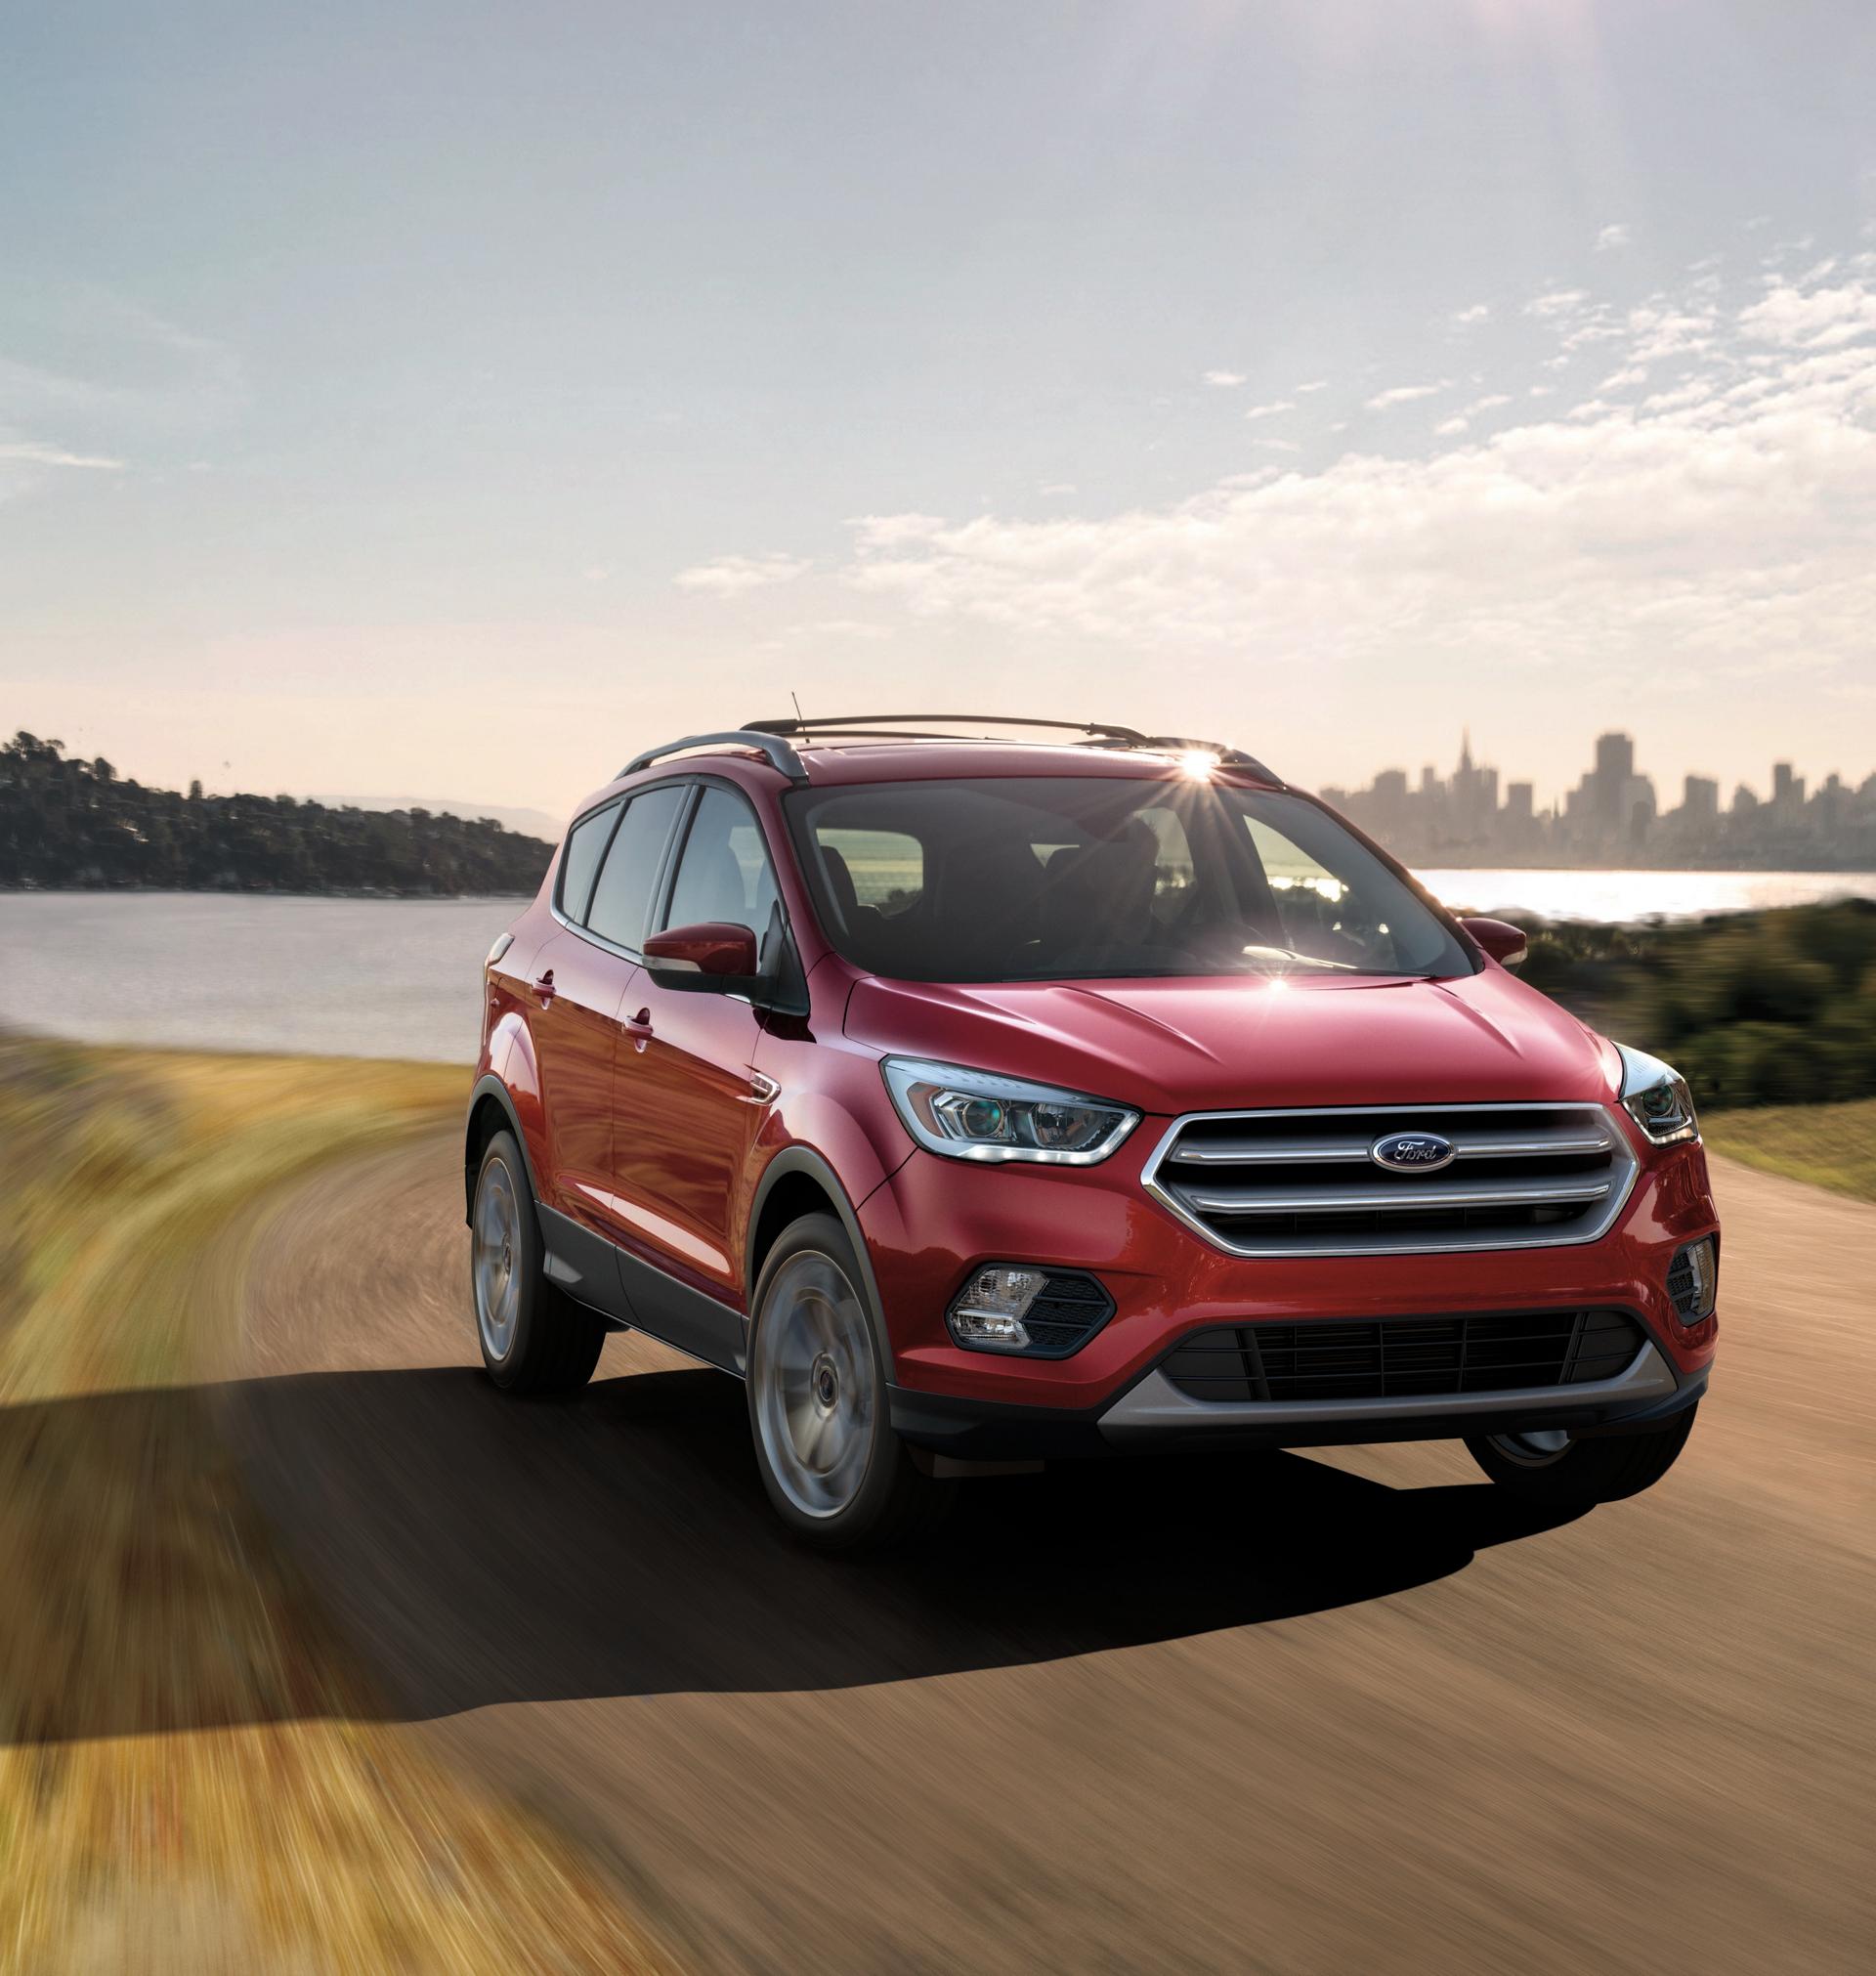 2017 Ford Escape © Ford Motor Company